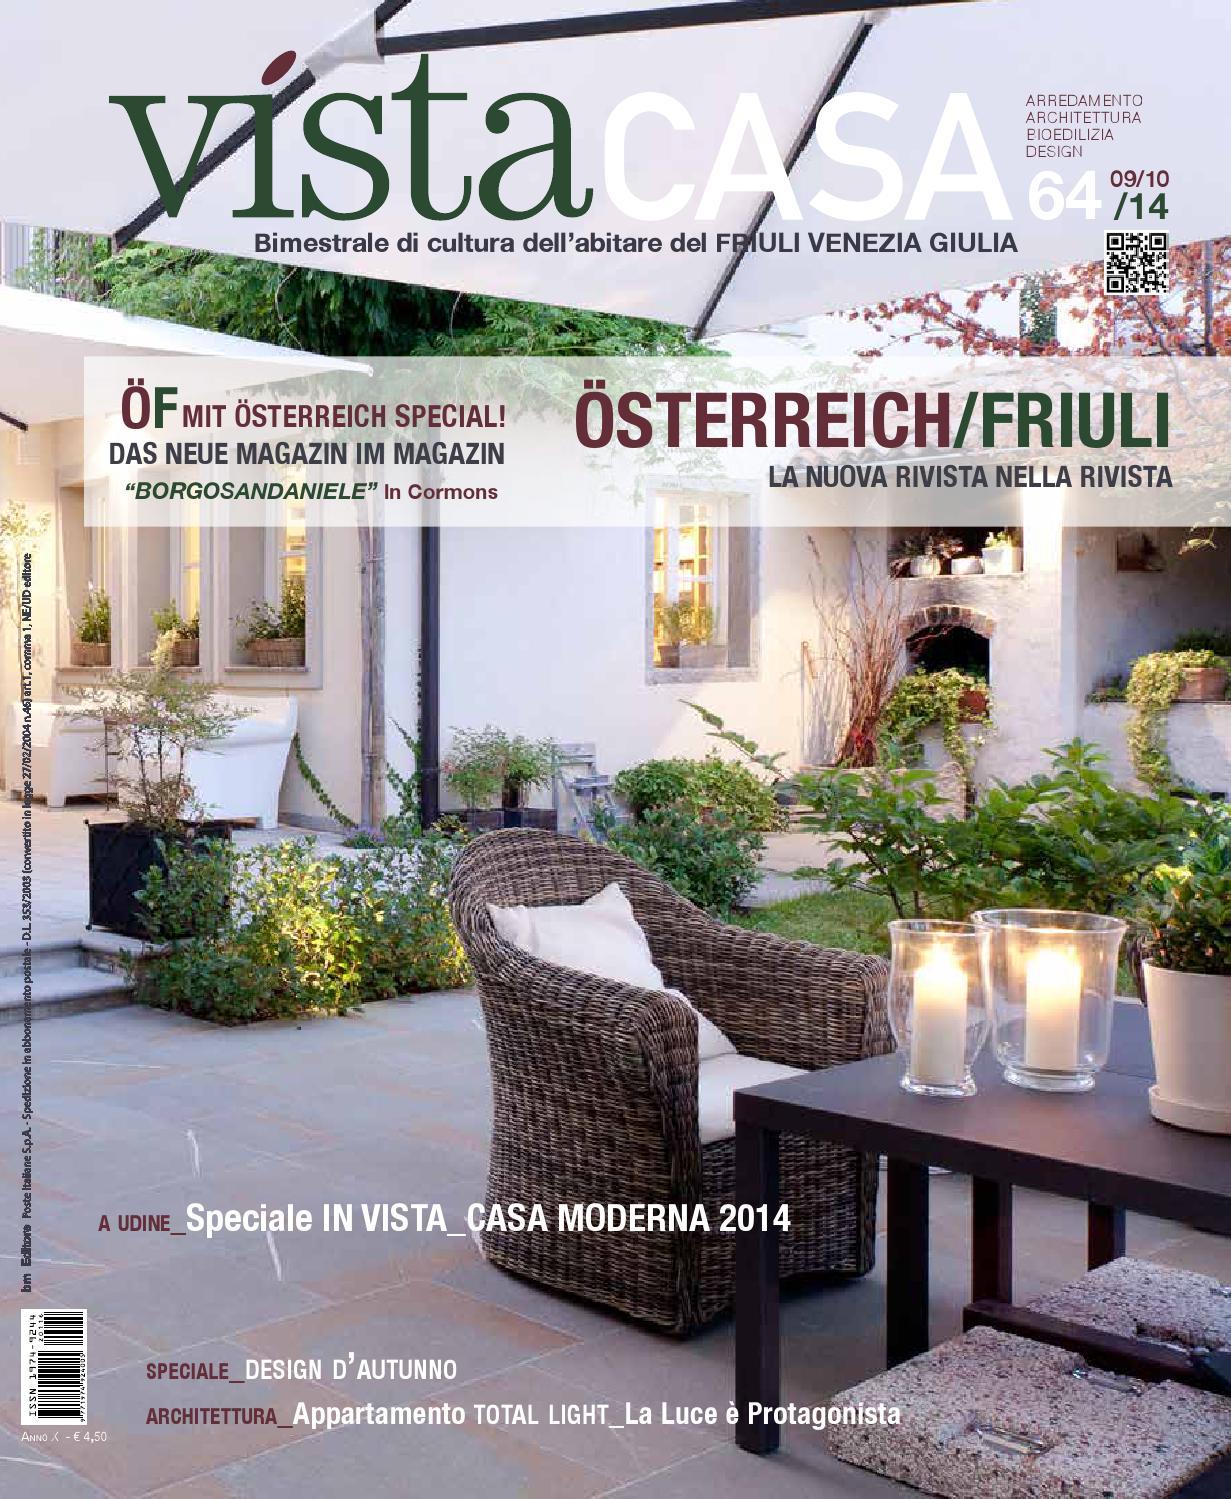 VistaCasa - Nov/Dic by Vistacasa by BM Editore - issuu